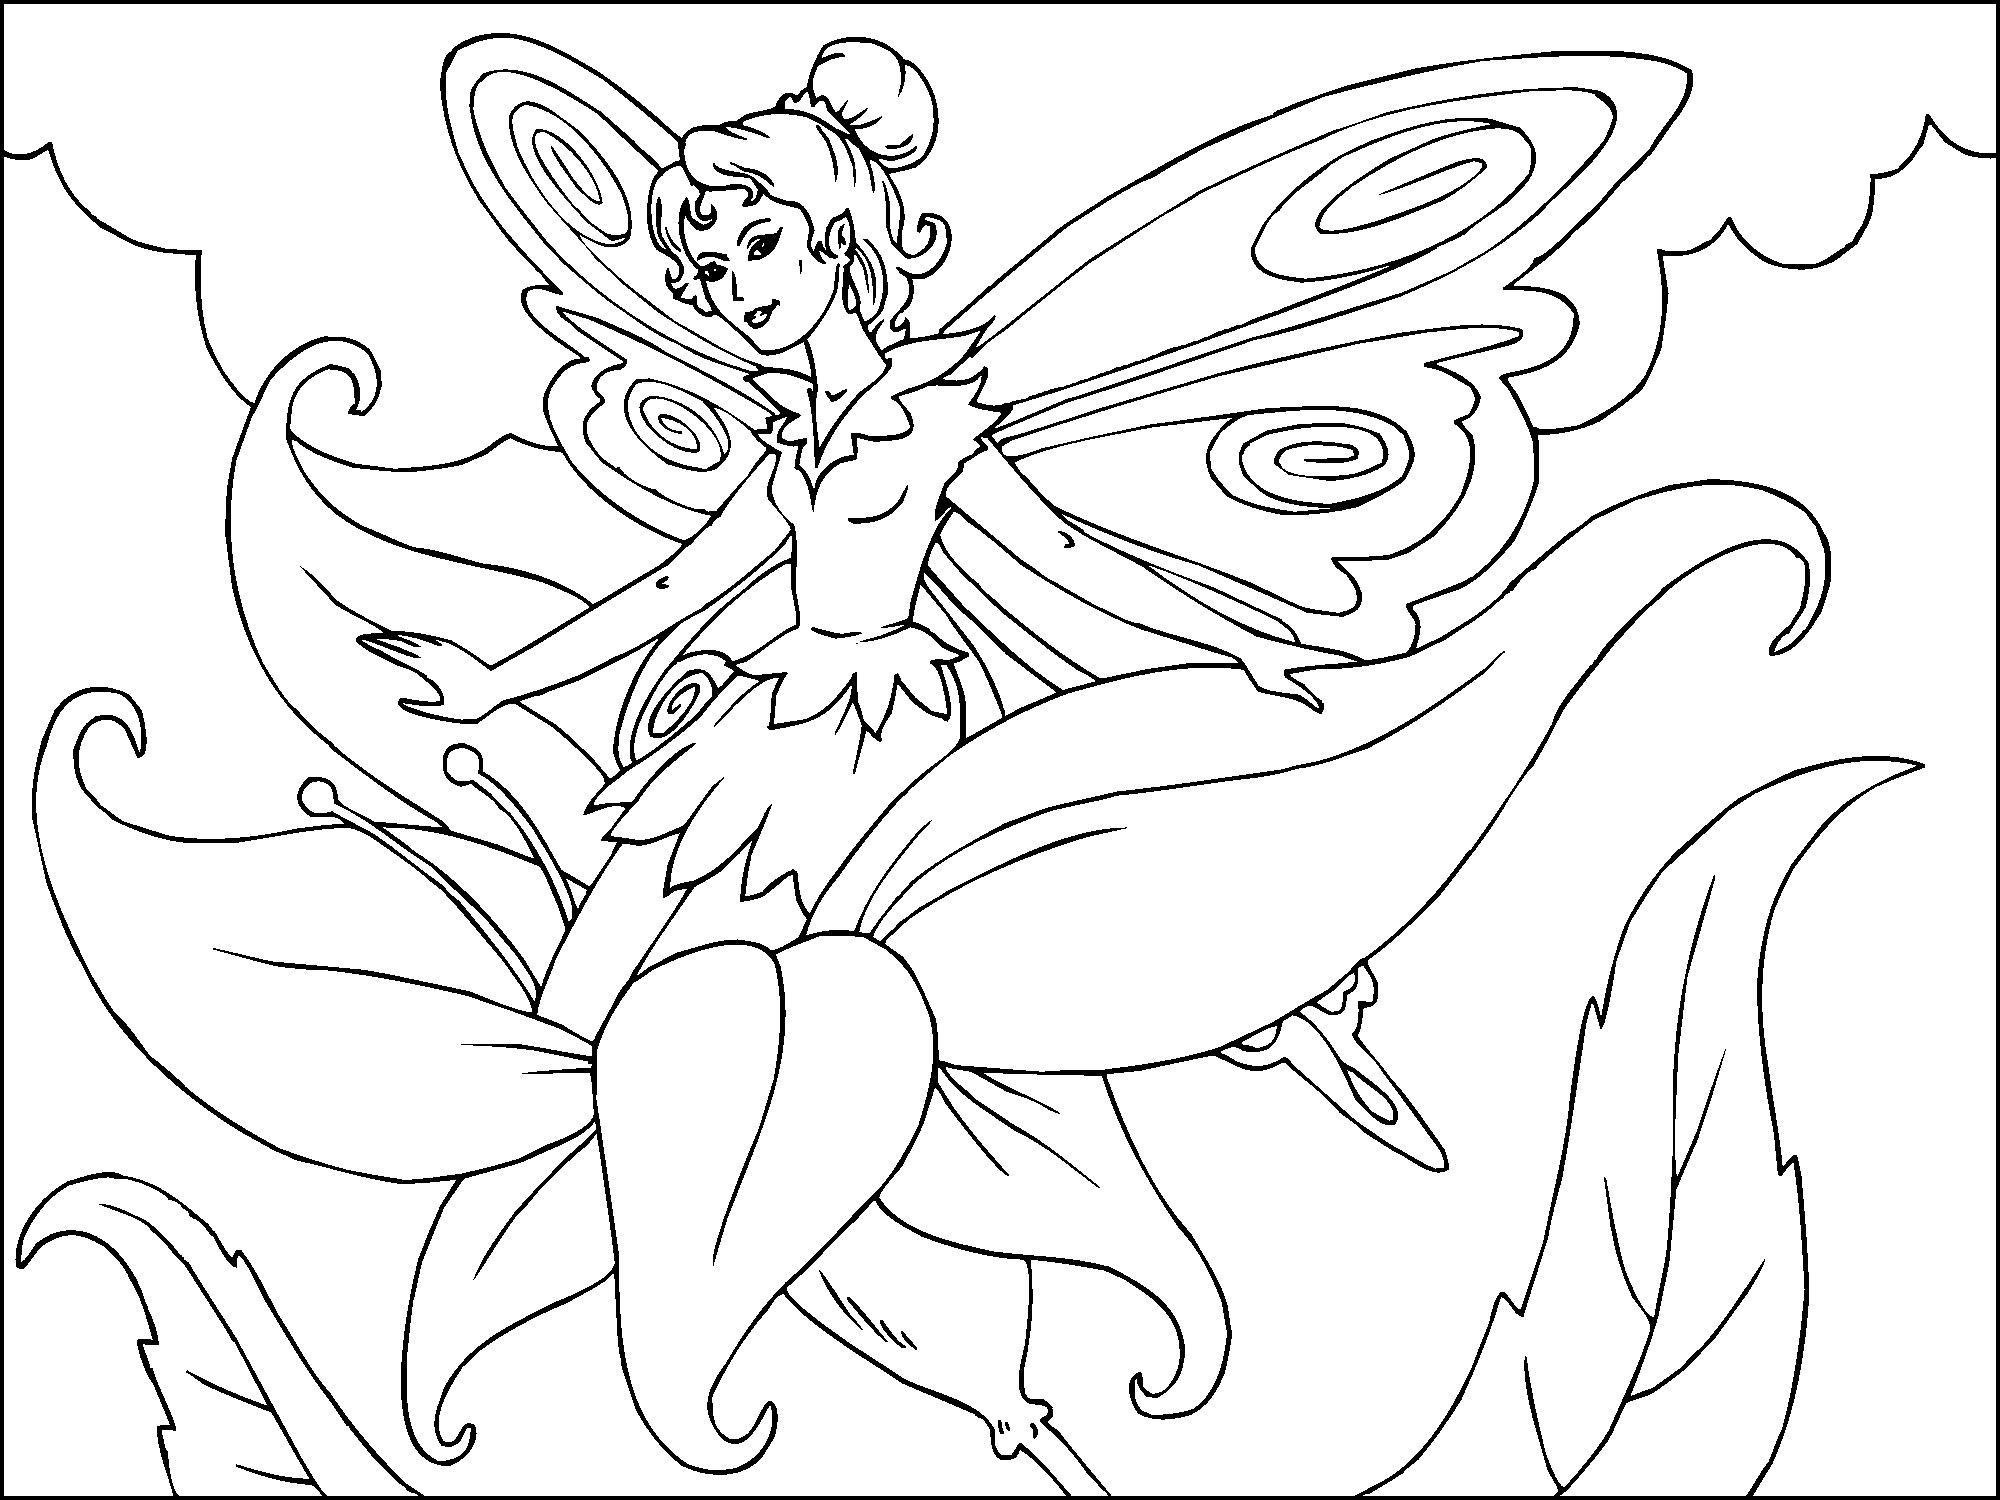 zauberfee malvorlage  coloring and malvorlagan